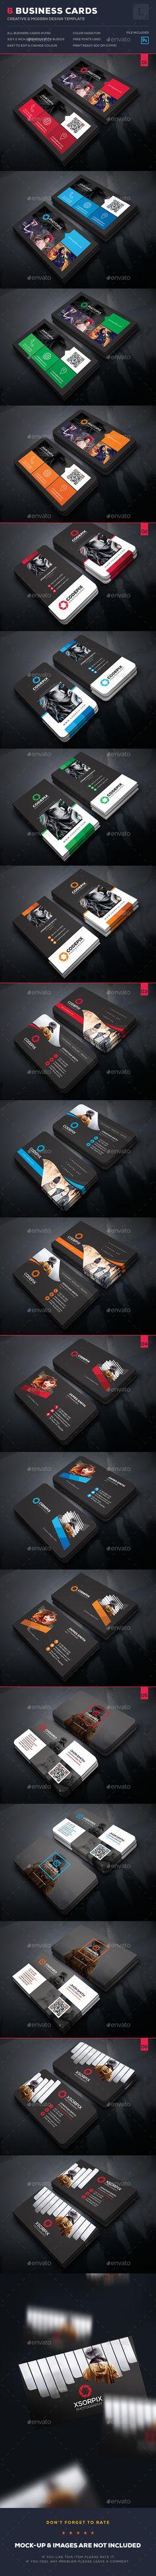 Photography Business Card Bundle - Business Cards Print Templates